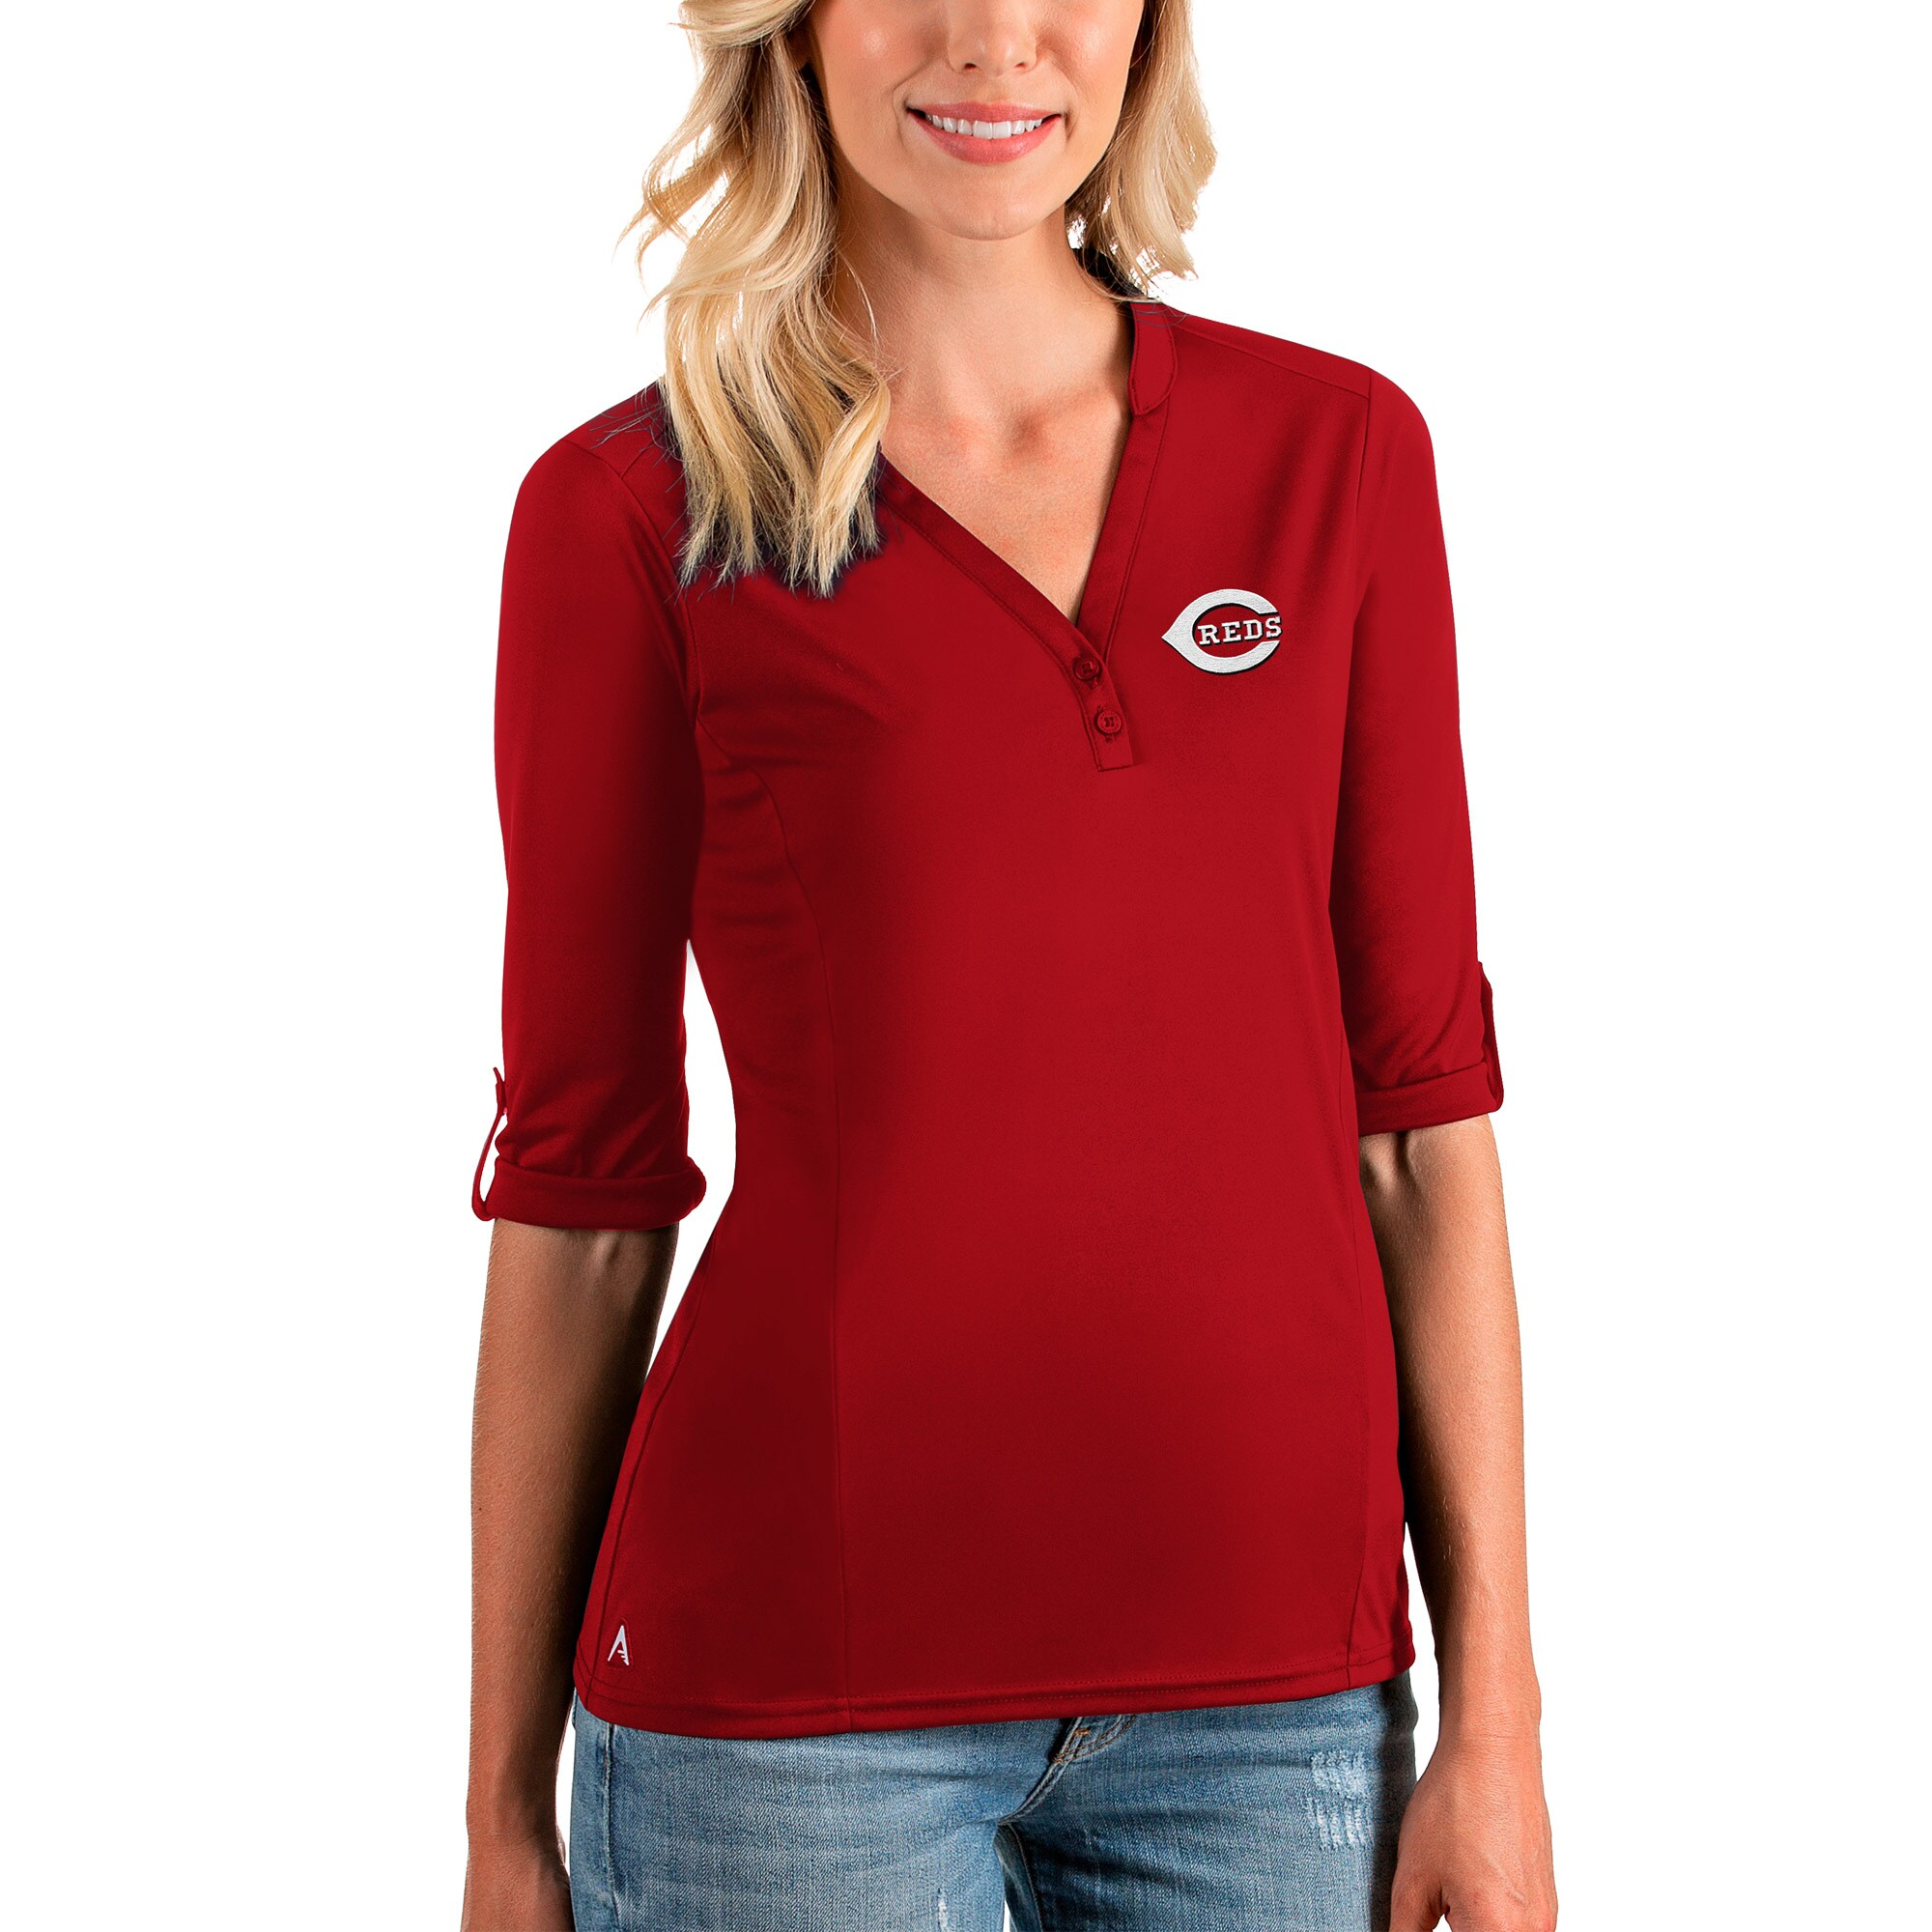 Cincinnati Reds Antigua Women's Accolade 3/4 Sleeve V-Neck Top - Red